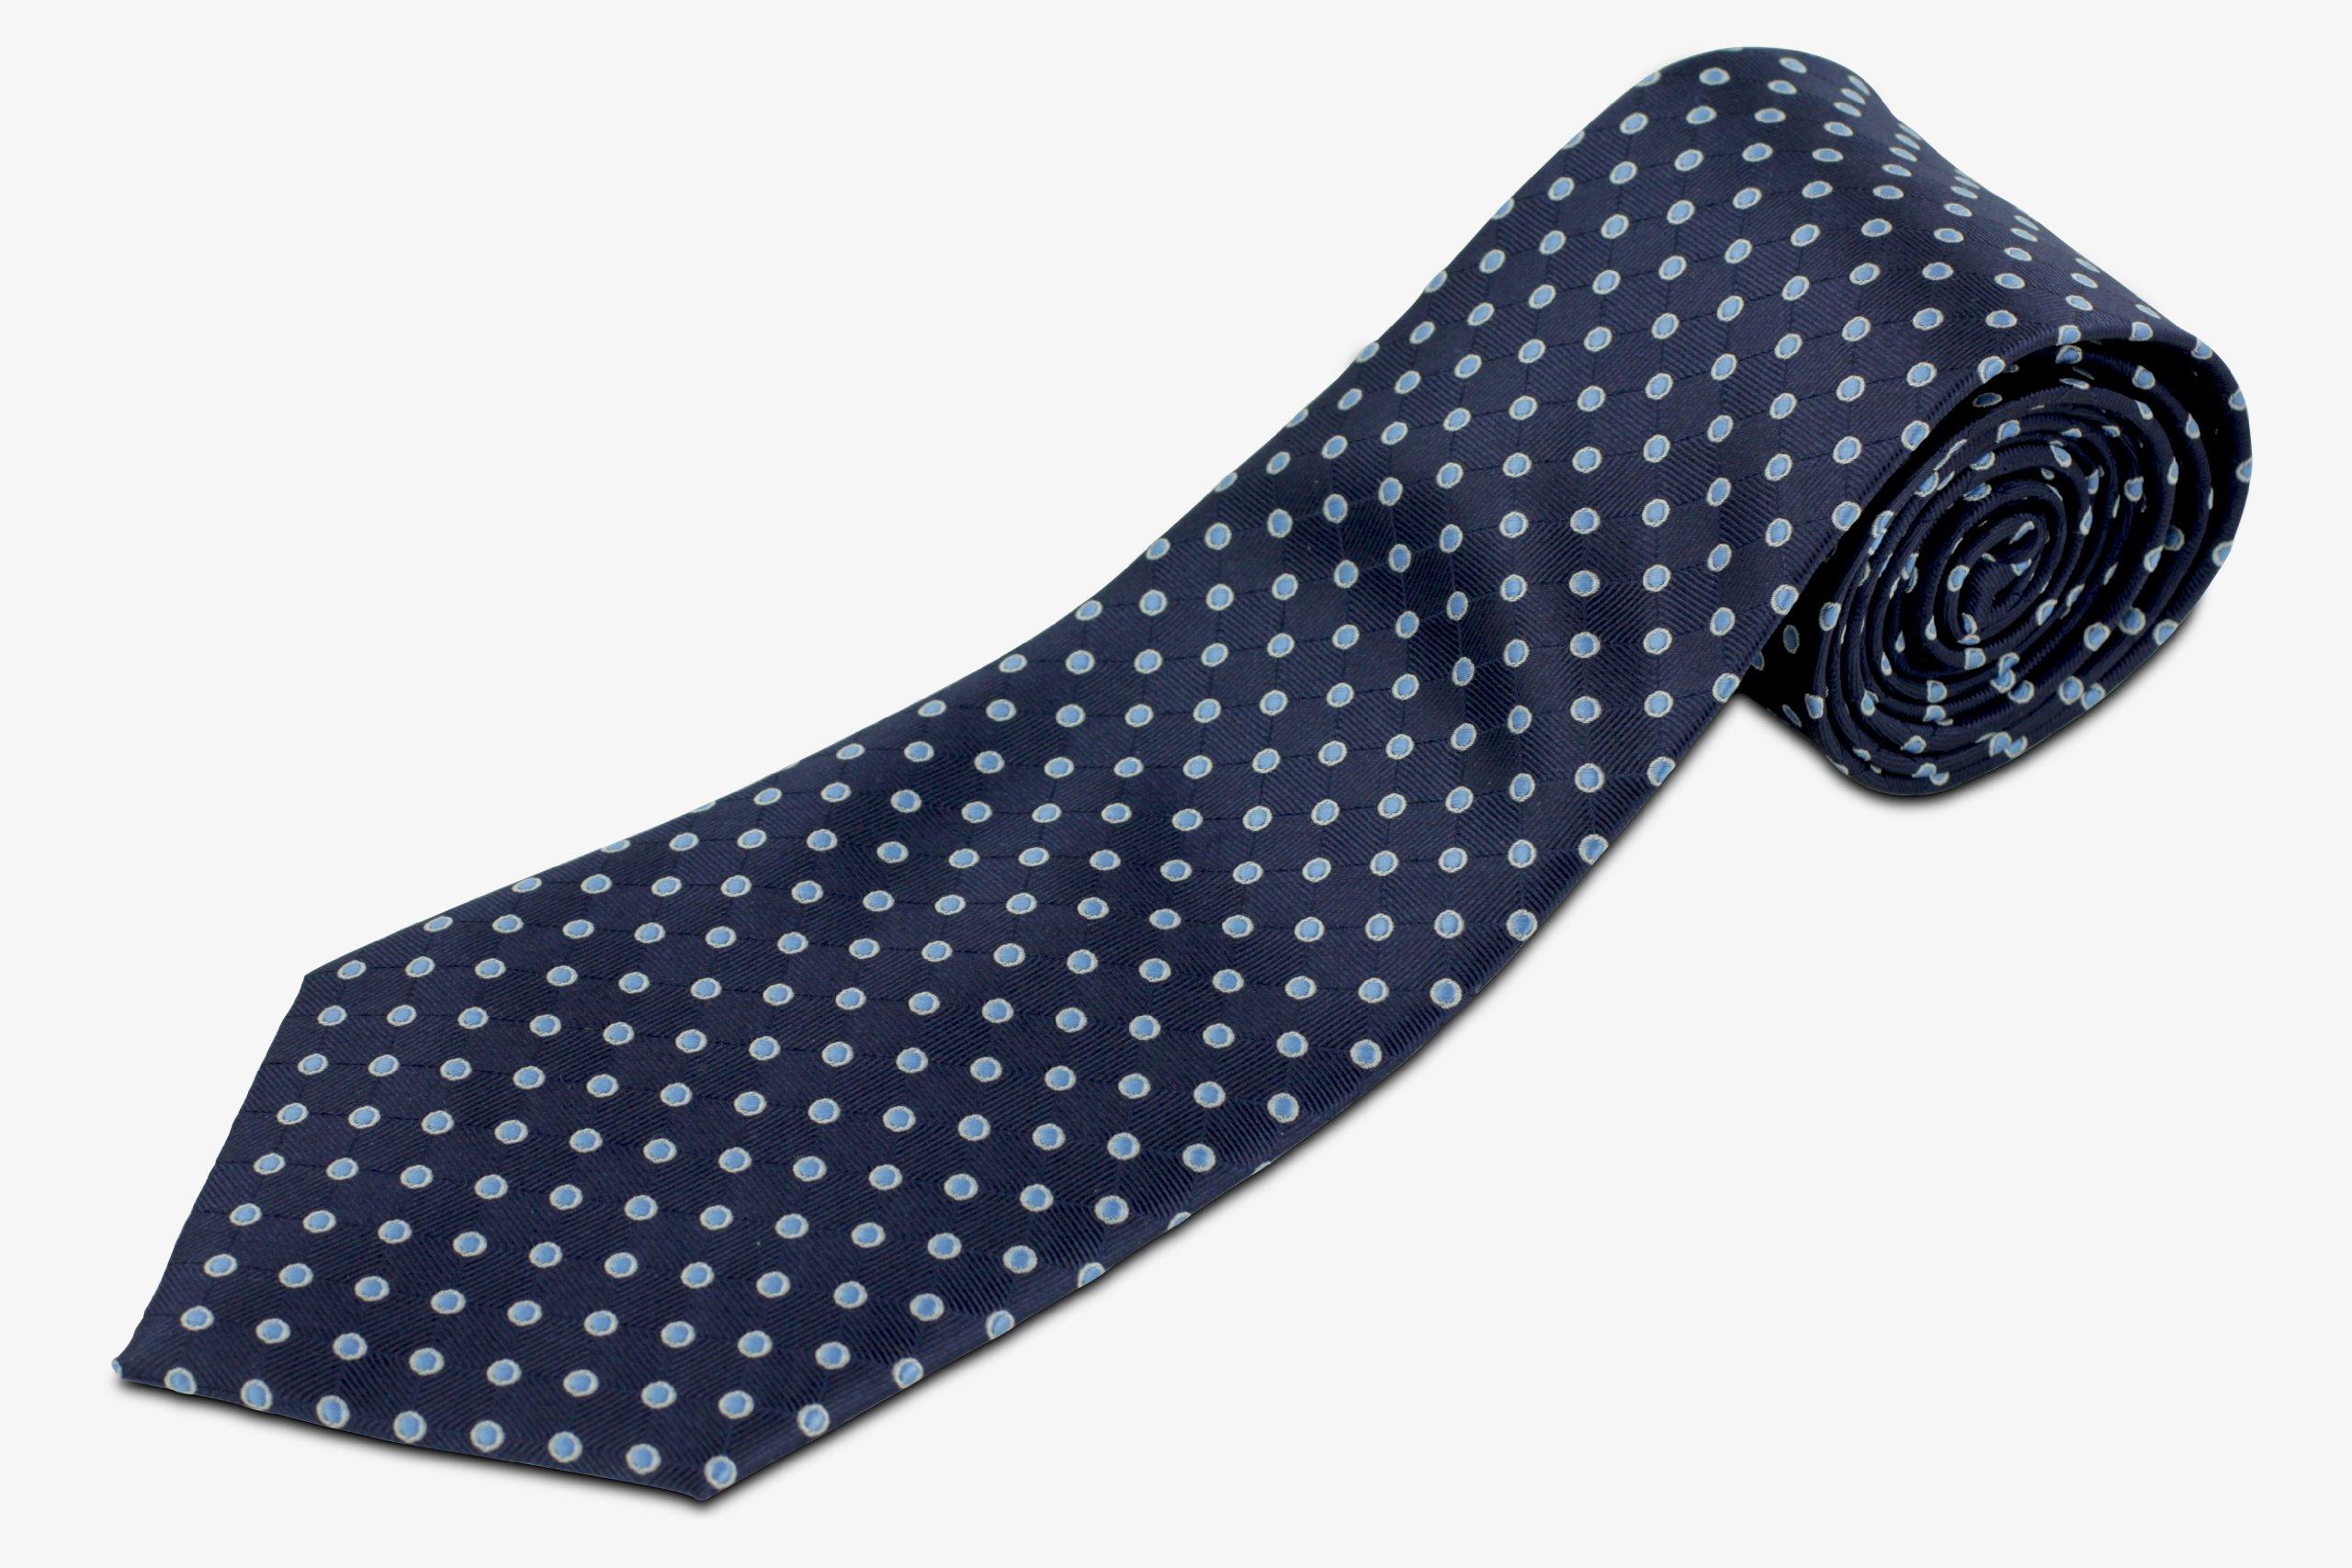 100% Silk Extra Long Navy Necktie with Polka Dots (70'' Long)